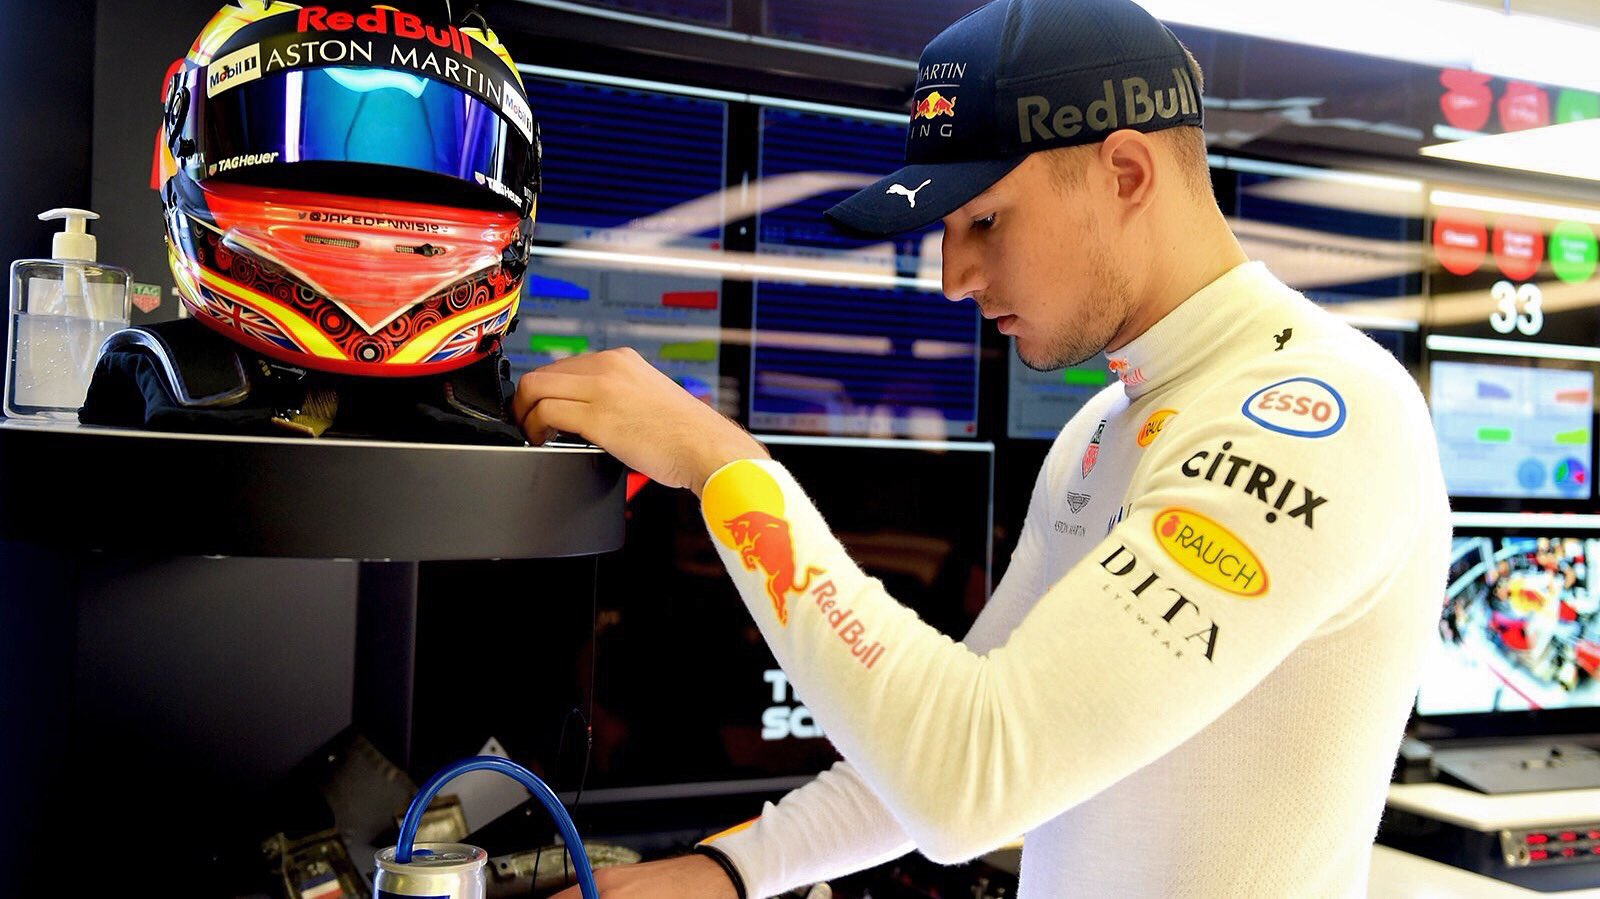 Red Bull 2019 F1 Driver.jpg